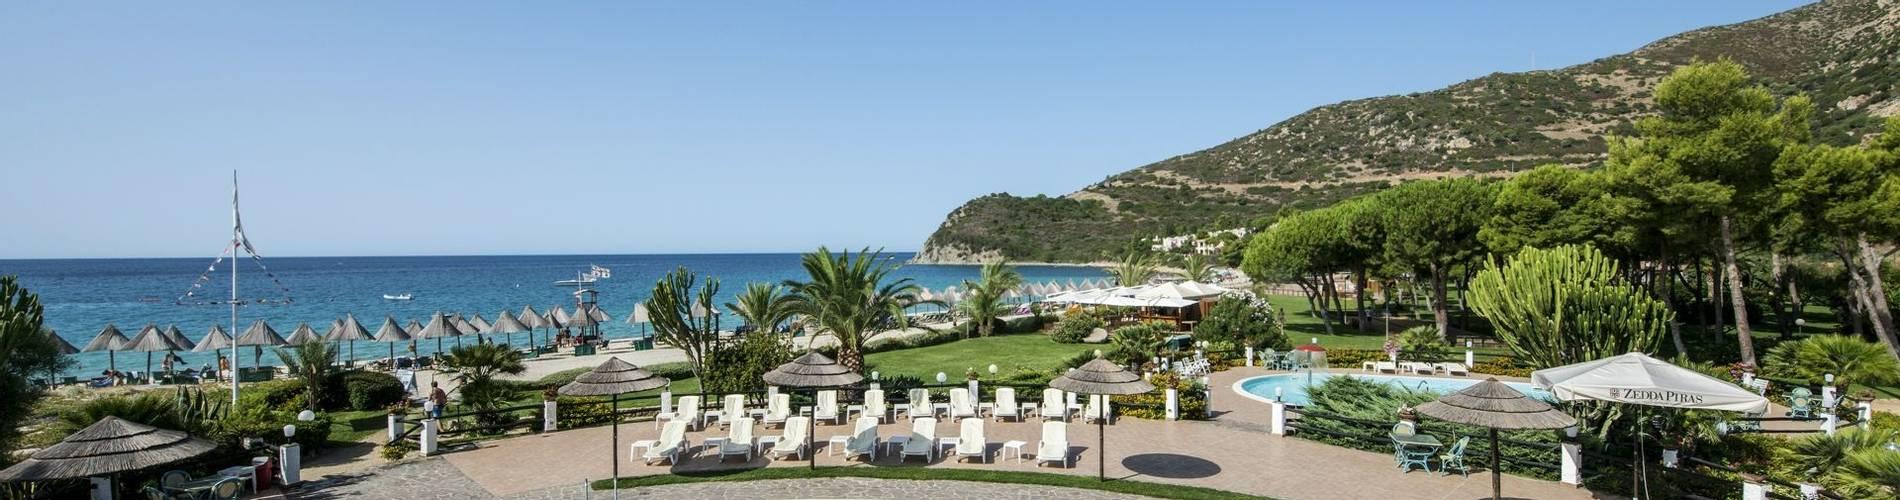 The swimmingpool at Hotel Cormoran, Villasimius